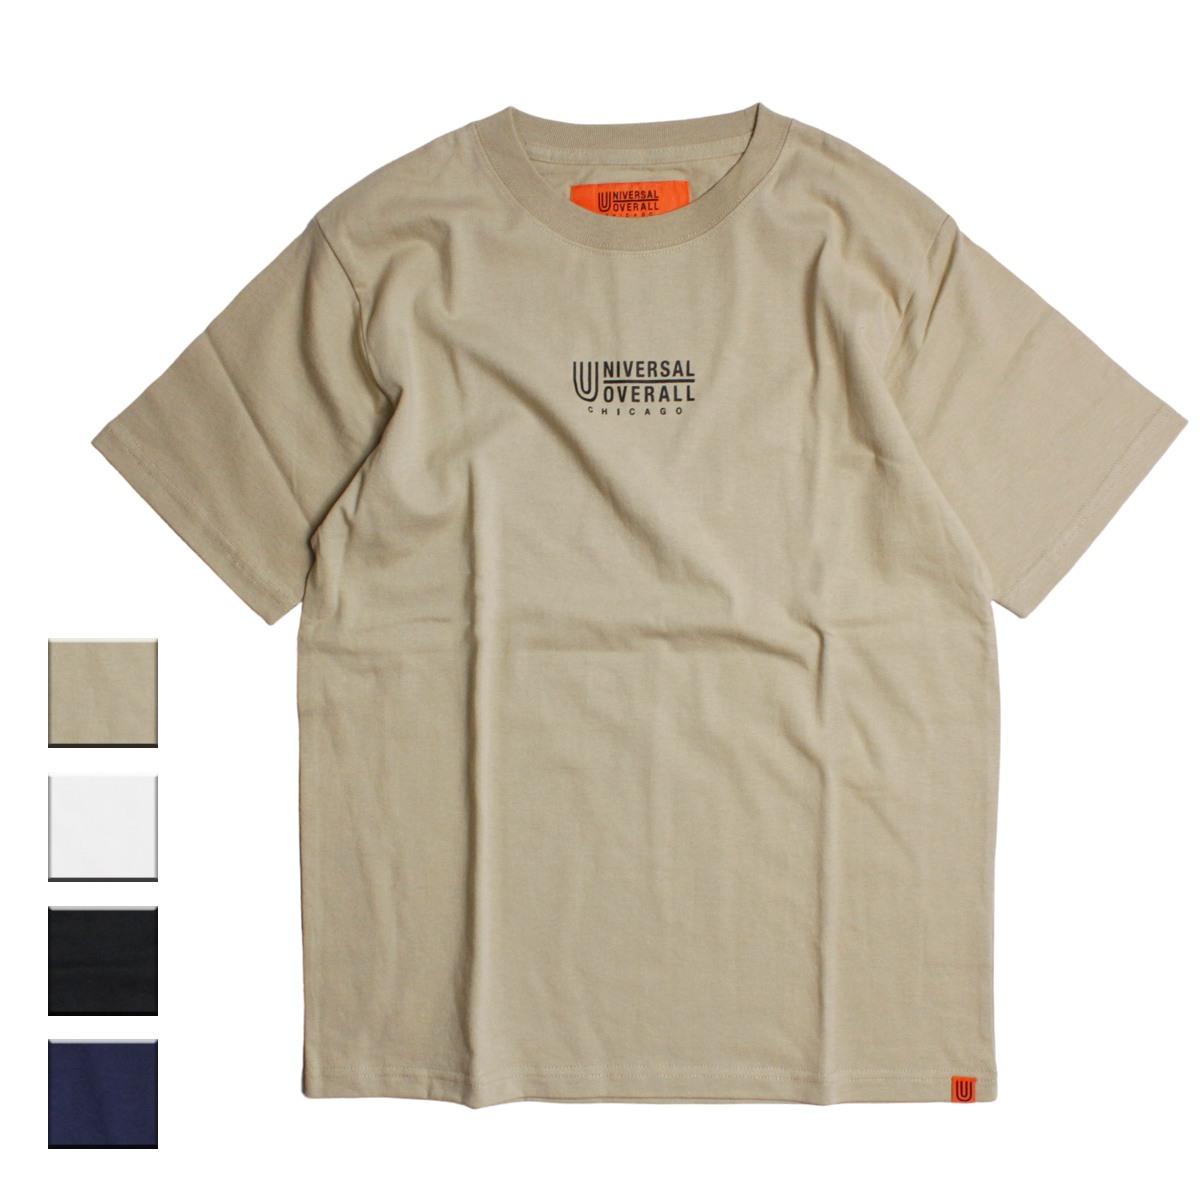 UNIVERSAL OVERALL ユニバーサルオーバーオール UO LOGO Tシャツ